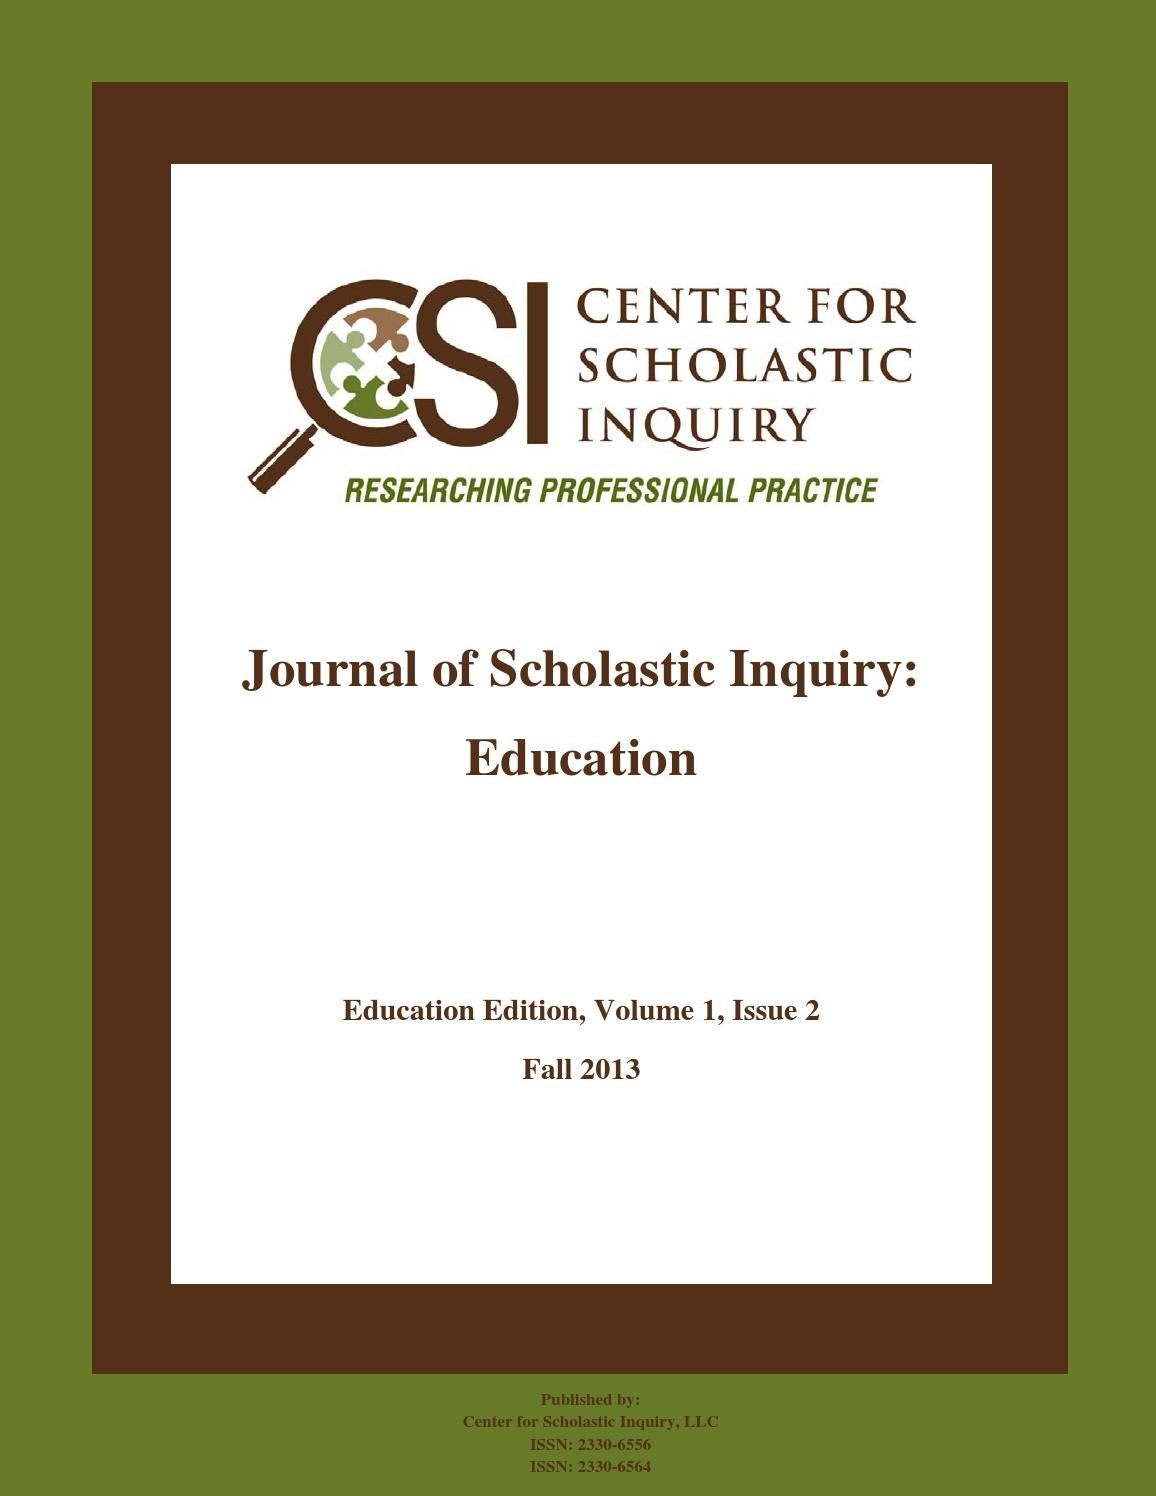 2006 scholastic entertainment inc web site copyright - Journal Of Scholastic Inquiry Education Volume 1 Issue 2 By Center For Scholastic Inquiry Issuu